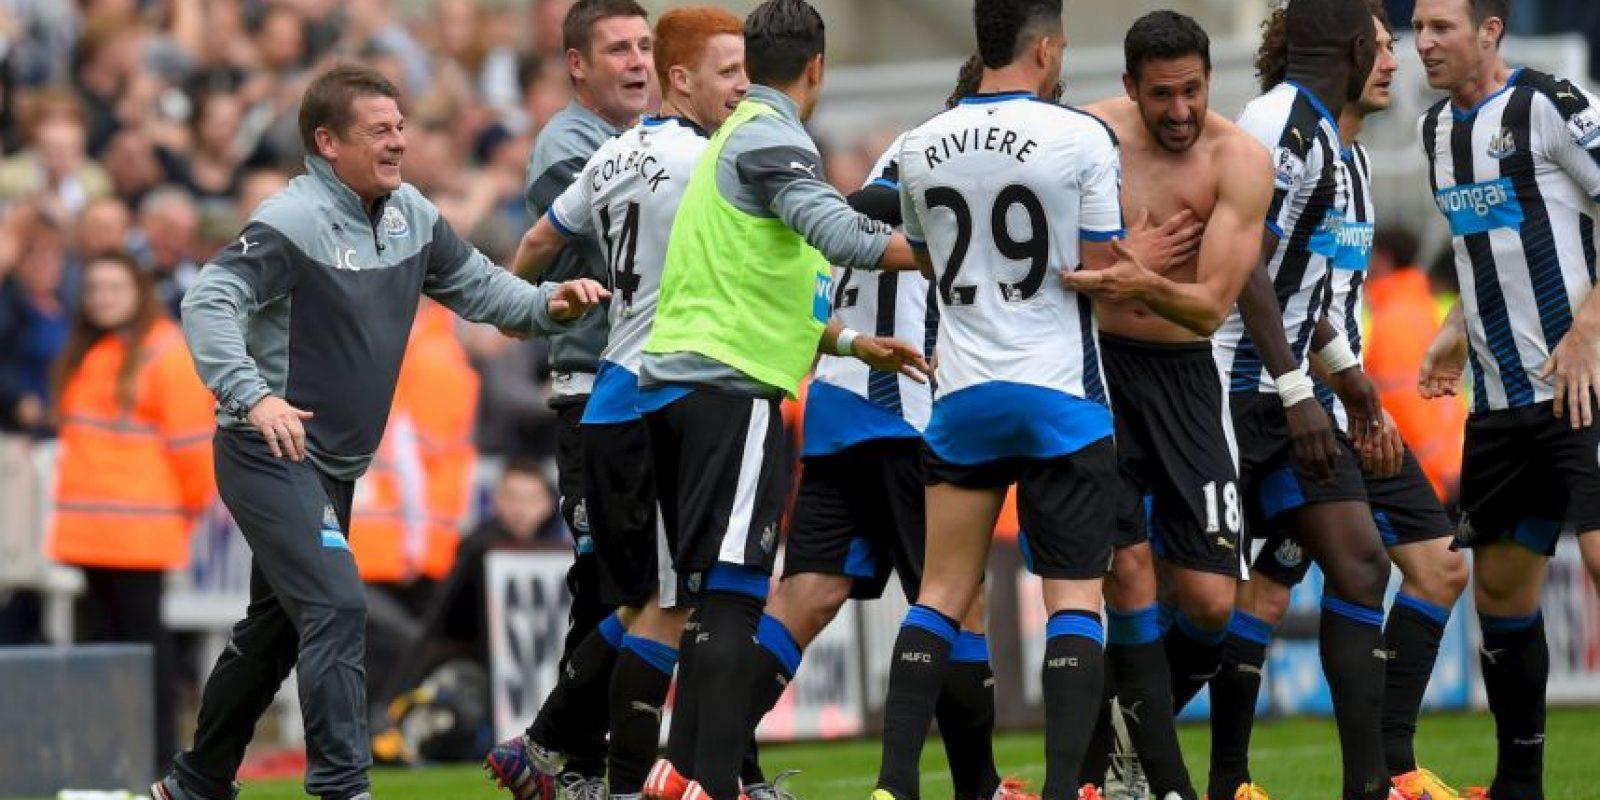 Marcó la segunda diana en el triunfo 2-0 sobre West Ham Foto:Getty Images